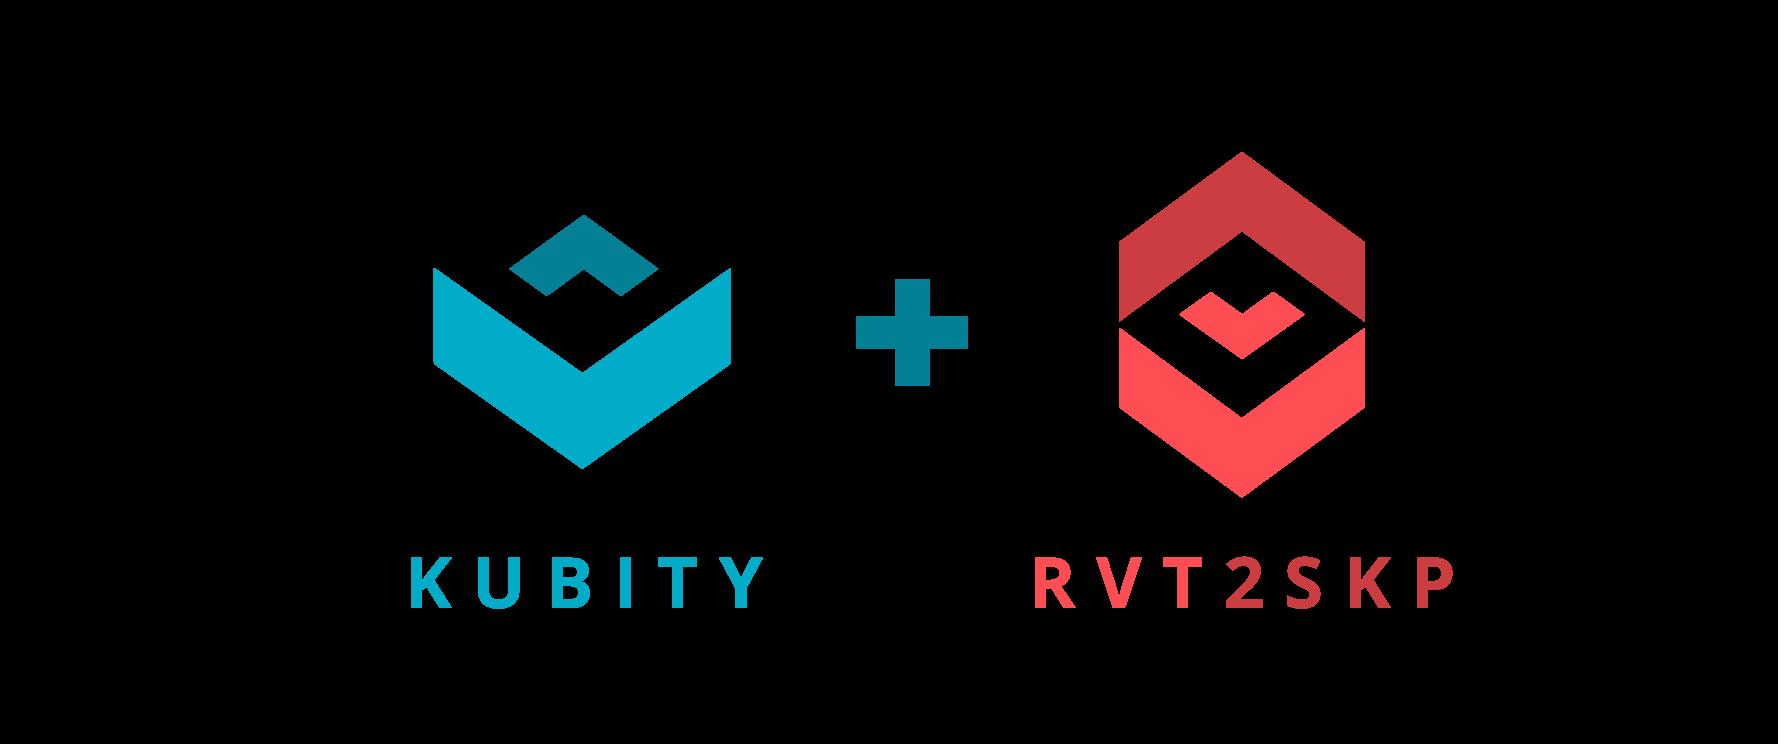 Kubity + rvt2skp — Buy a Kubity 1-year license & get rvt2skp for FREE